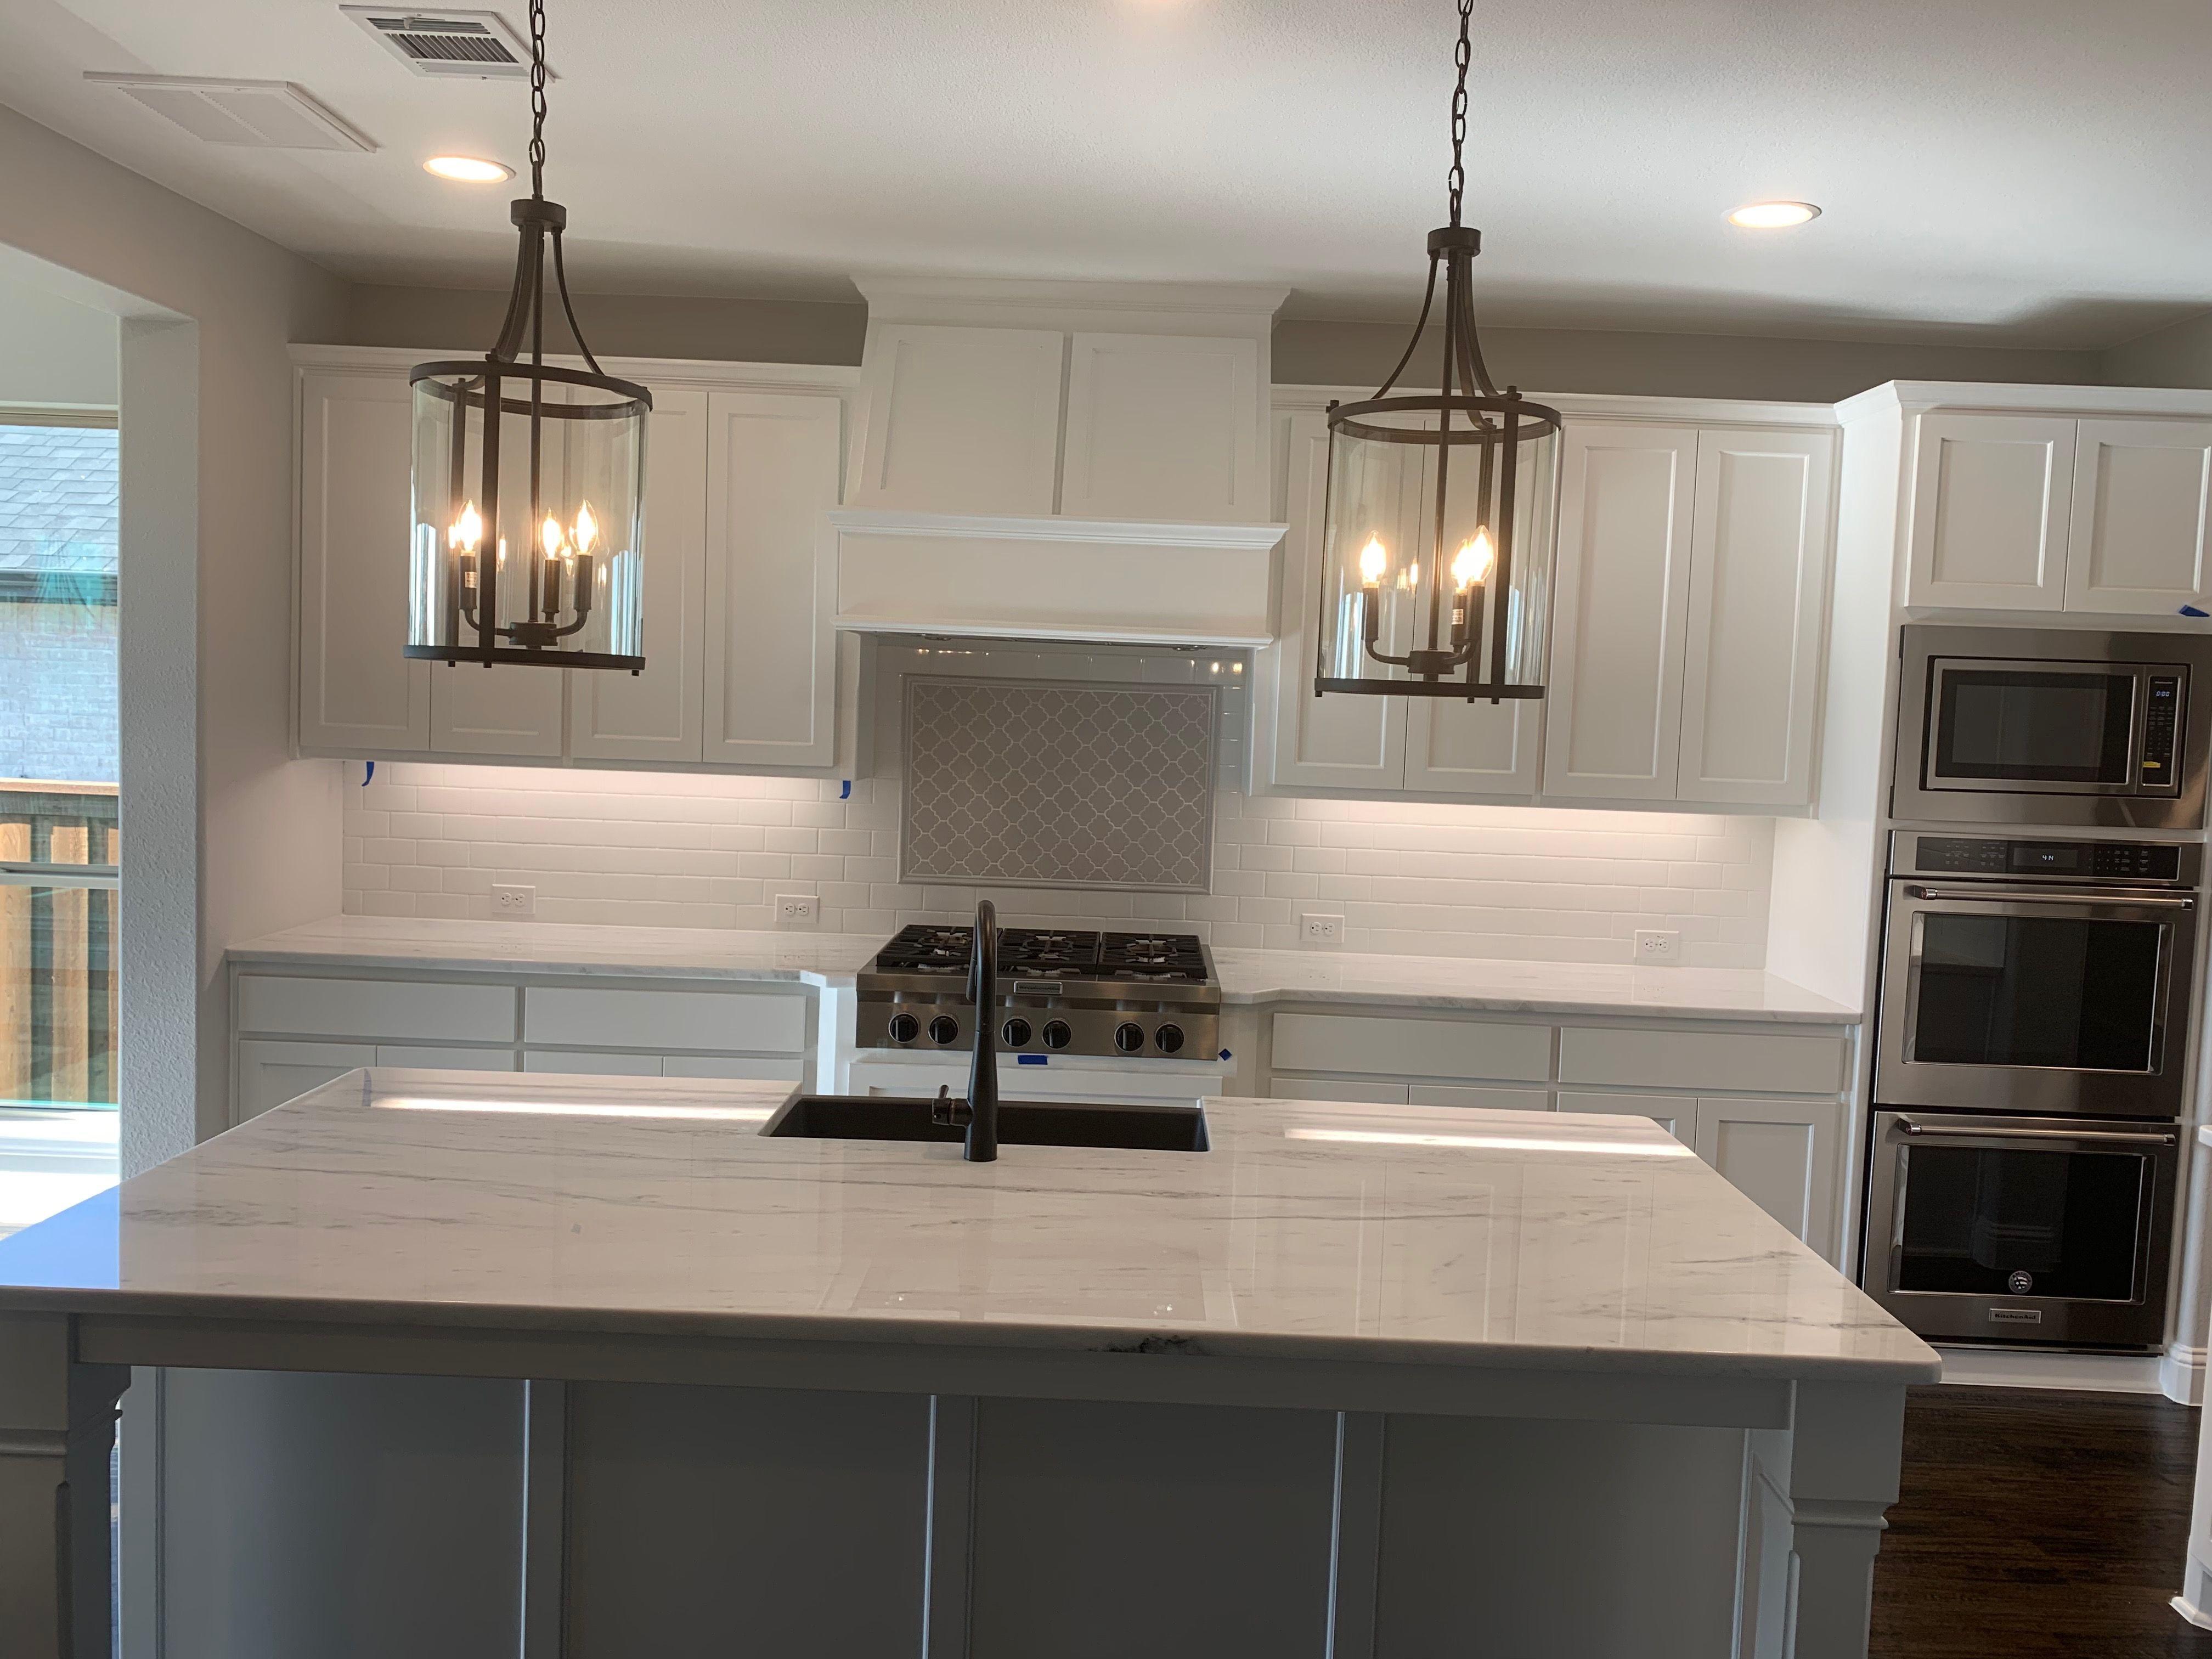 Tesoro Bianco Marble By Allure Natural Stone Kitchen Interior Kitchen Countertops Marble Countertops